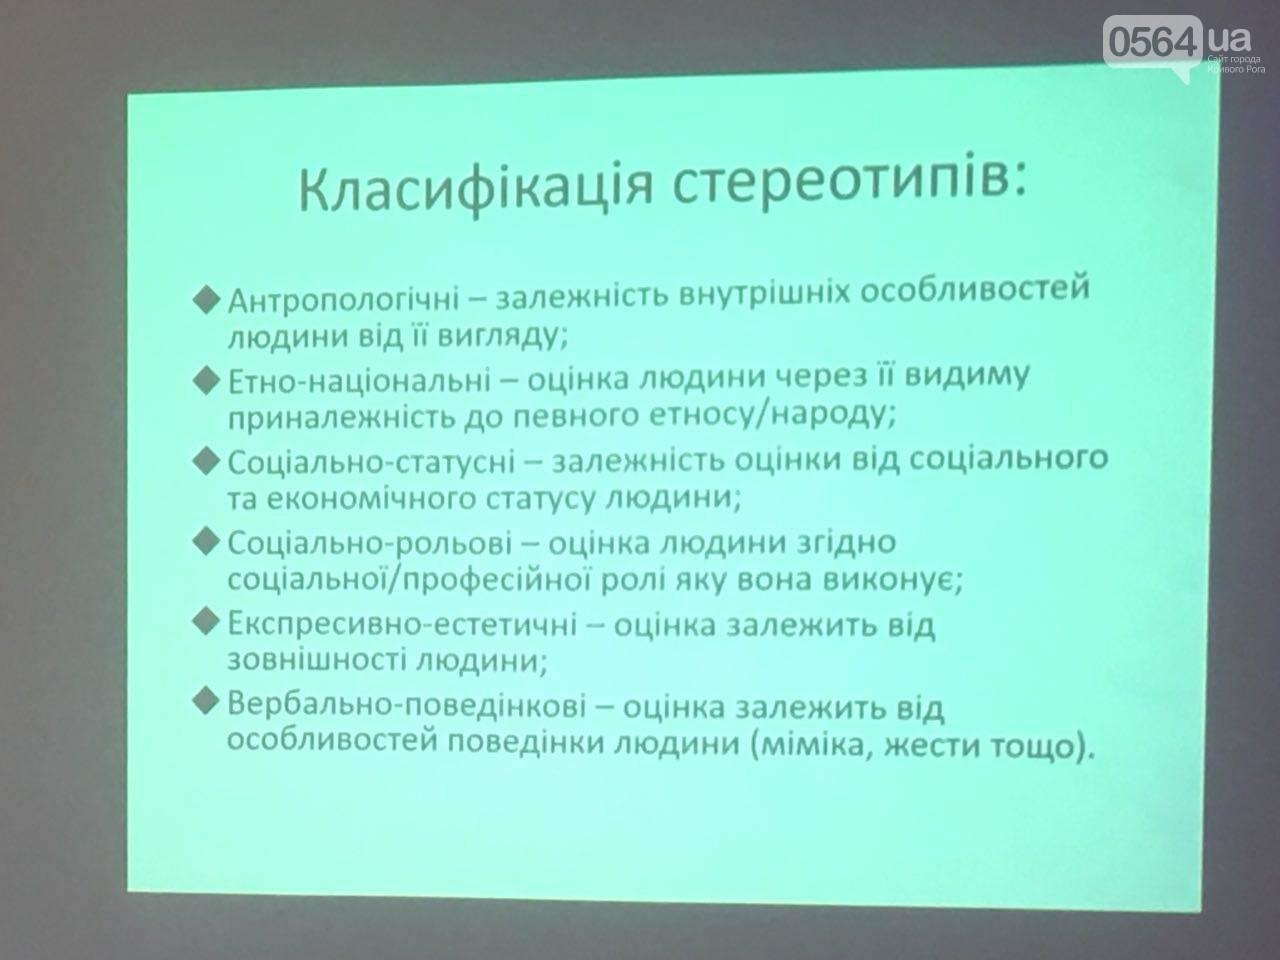 На тренинге о ВИЧ и медреформе криворожским журналистам рассказали о дискриминации и стереотипах, - ФОТО , фото-16